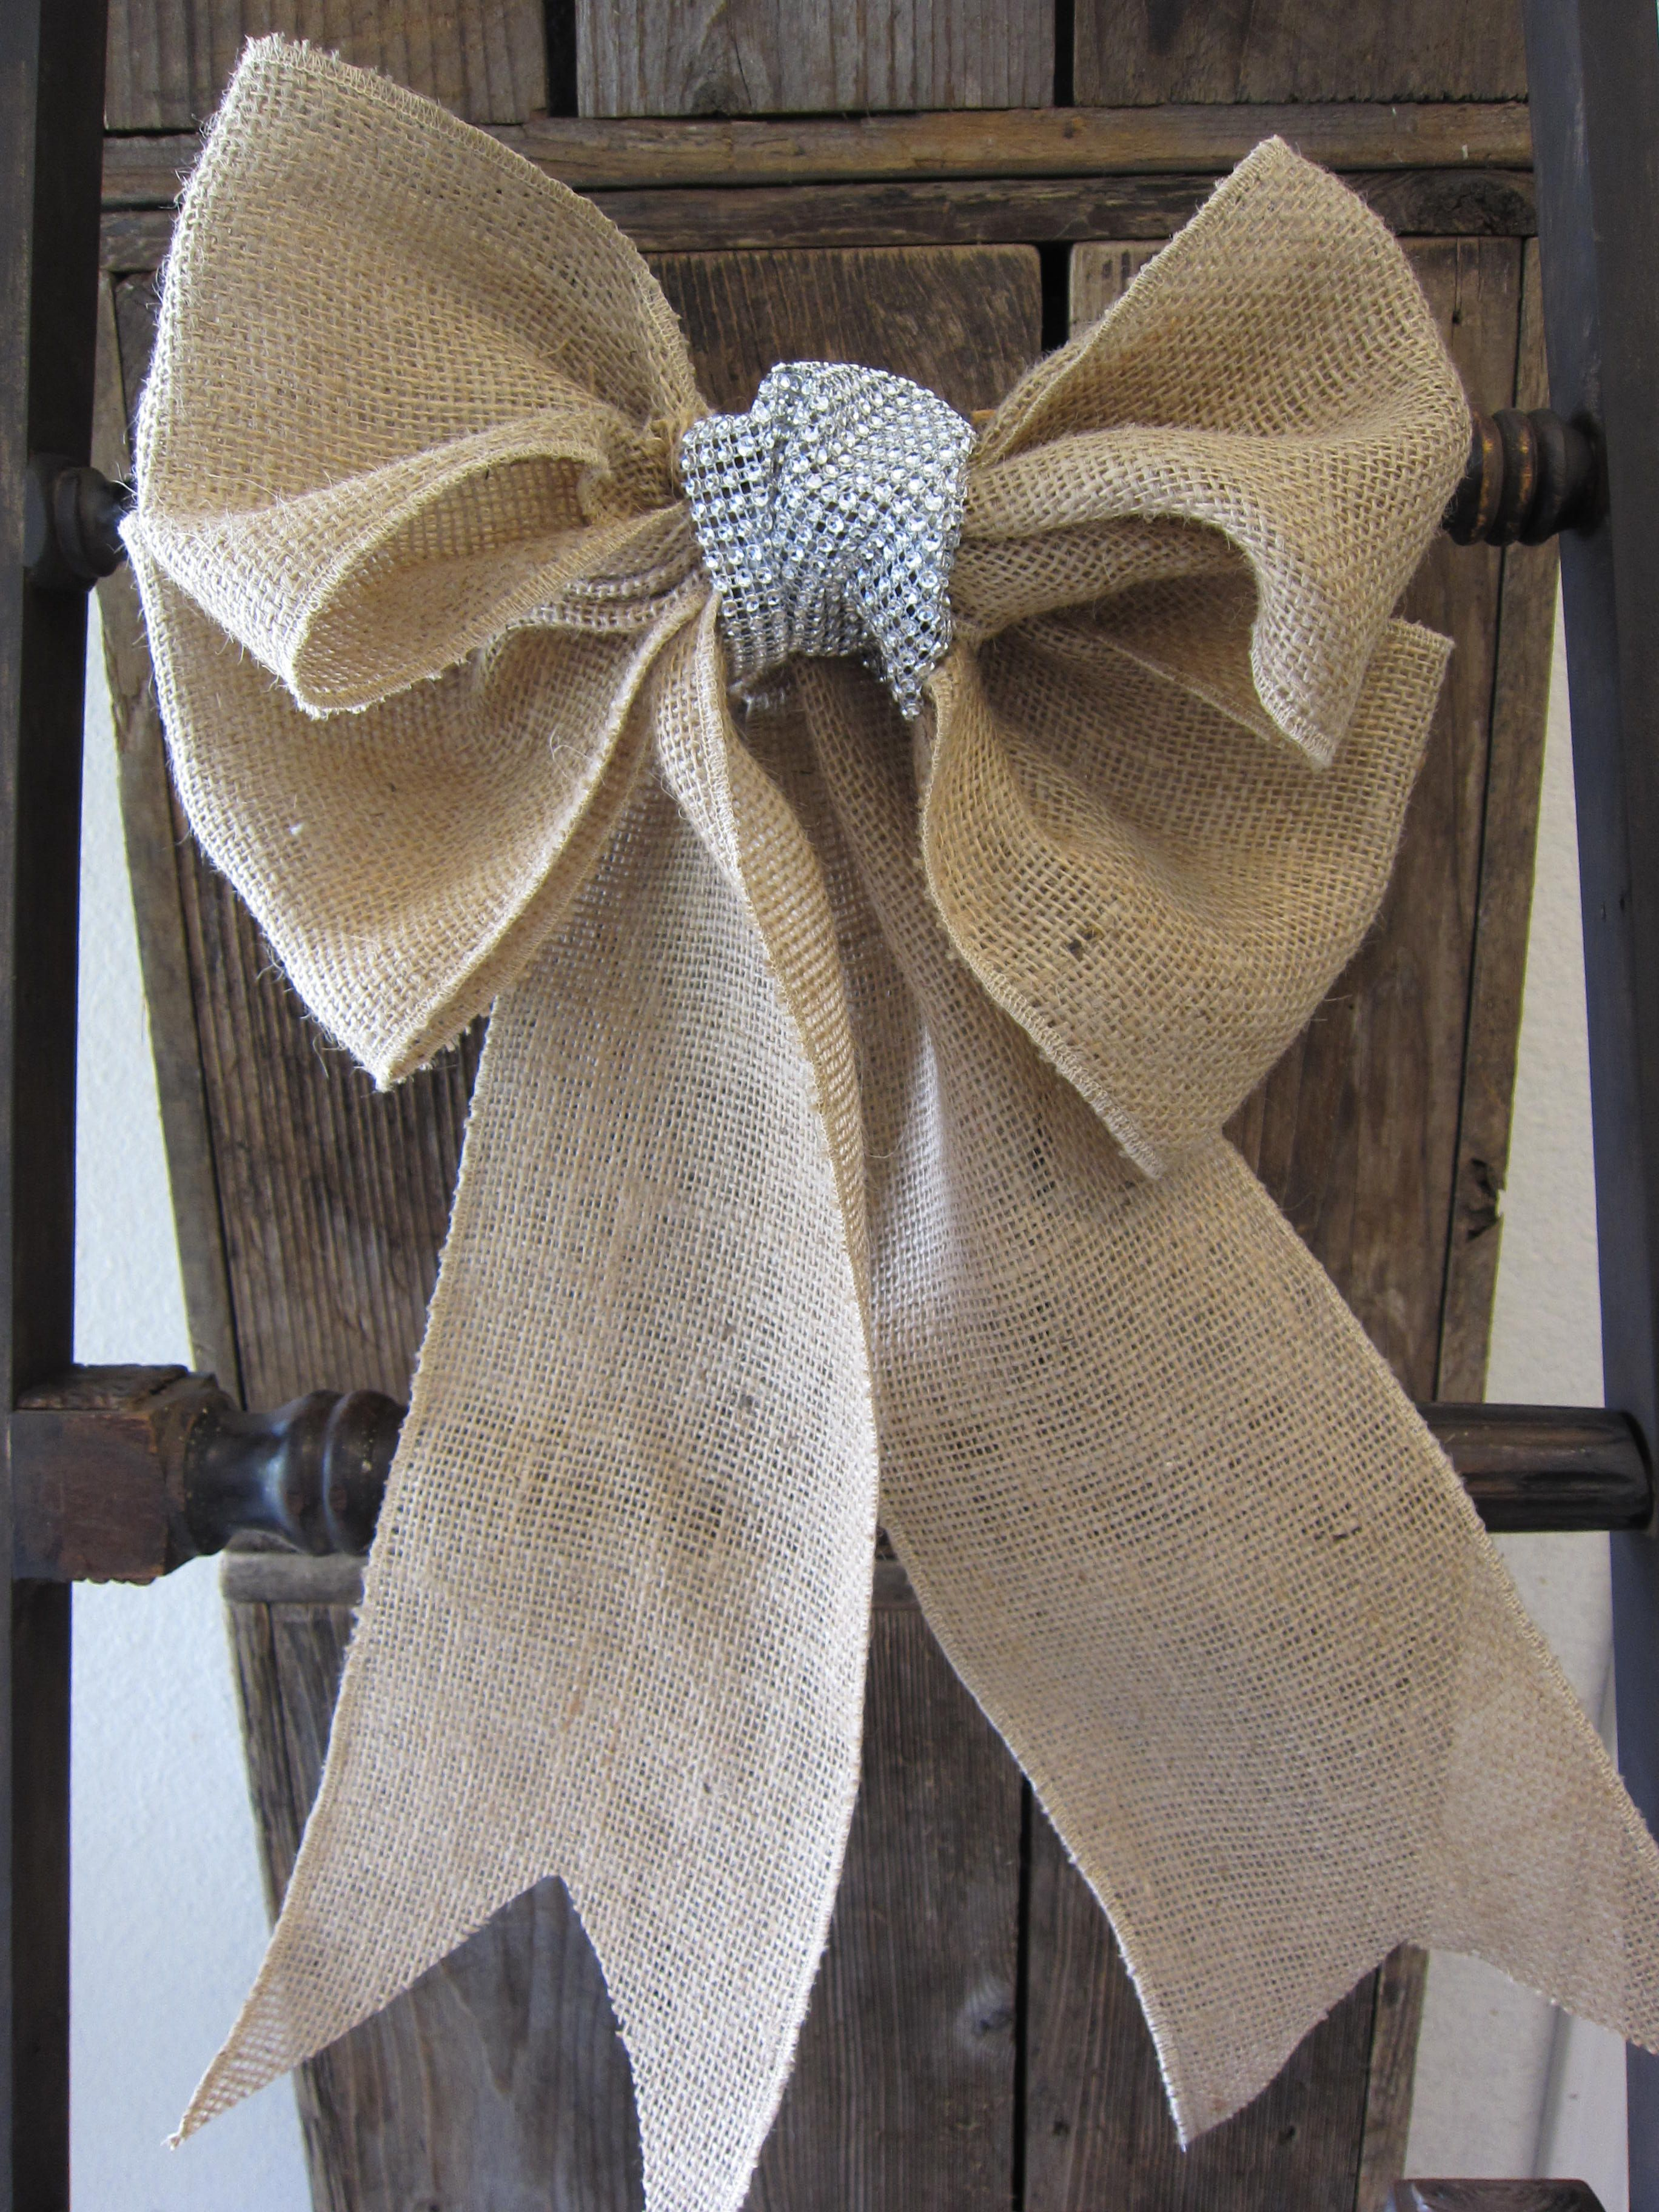 Christmas burlap rustic bow with rhinestone center